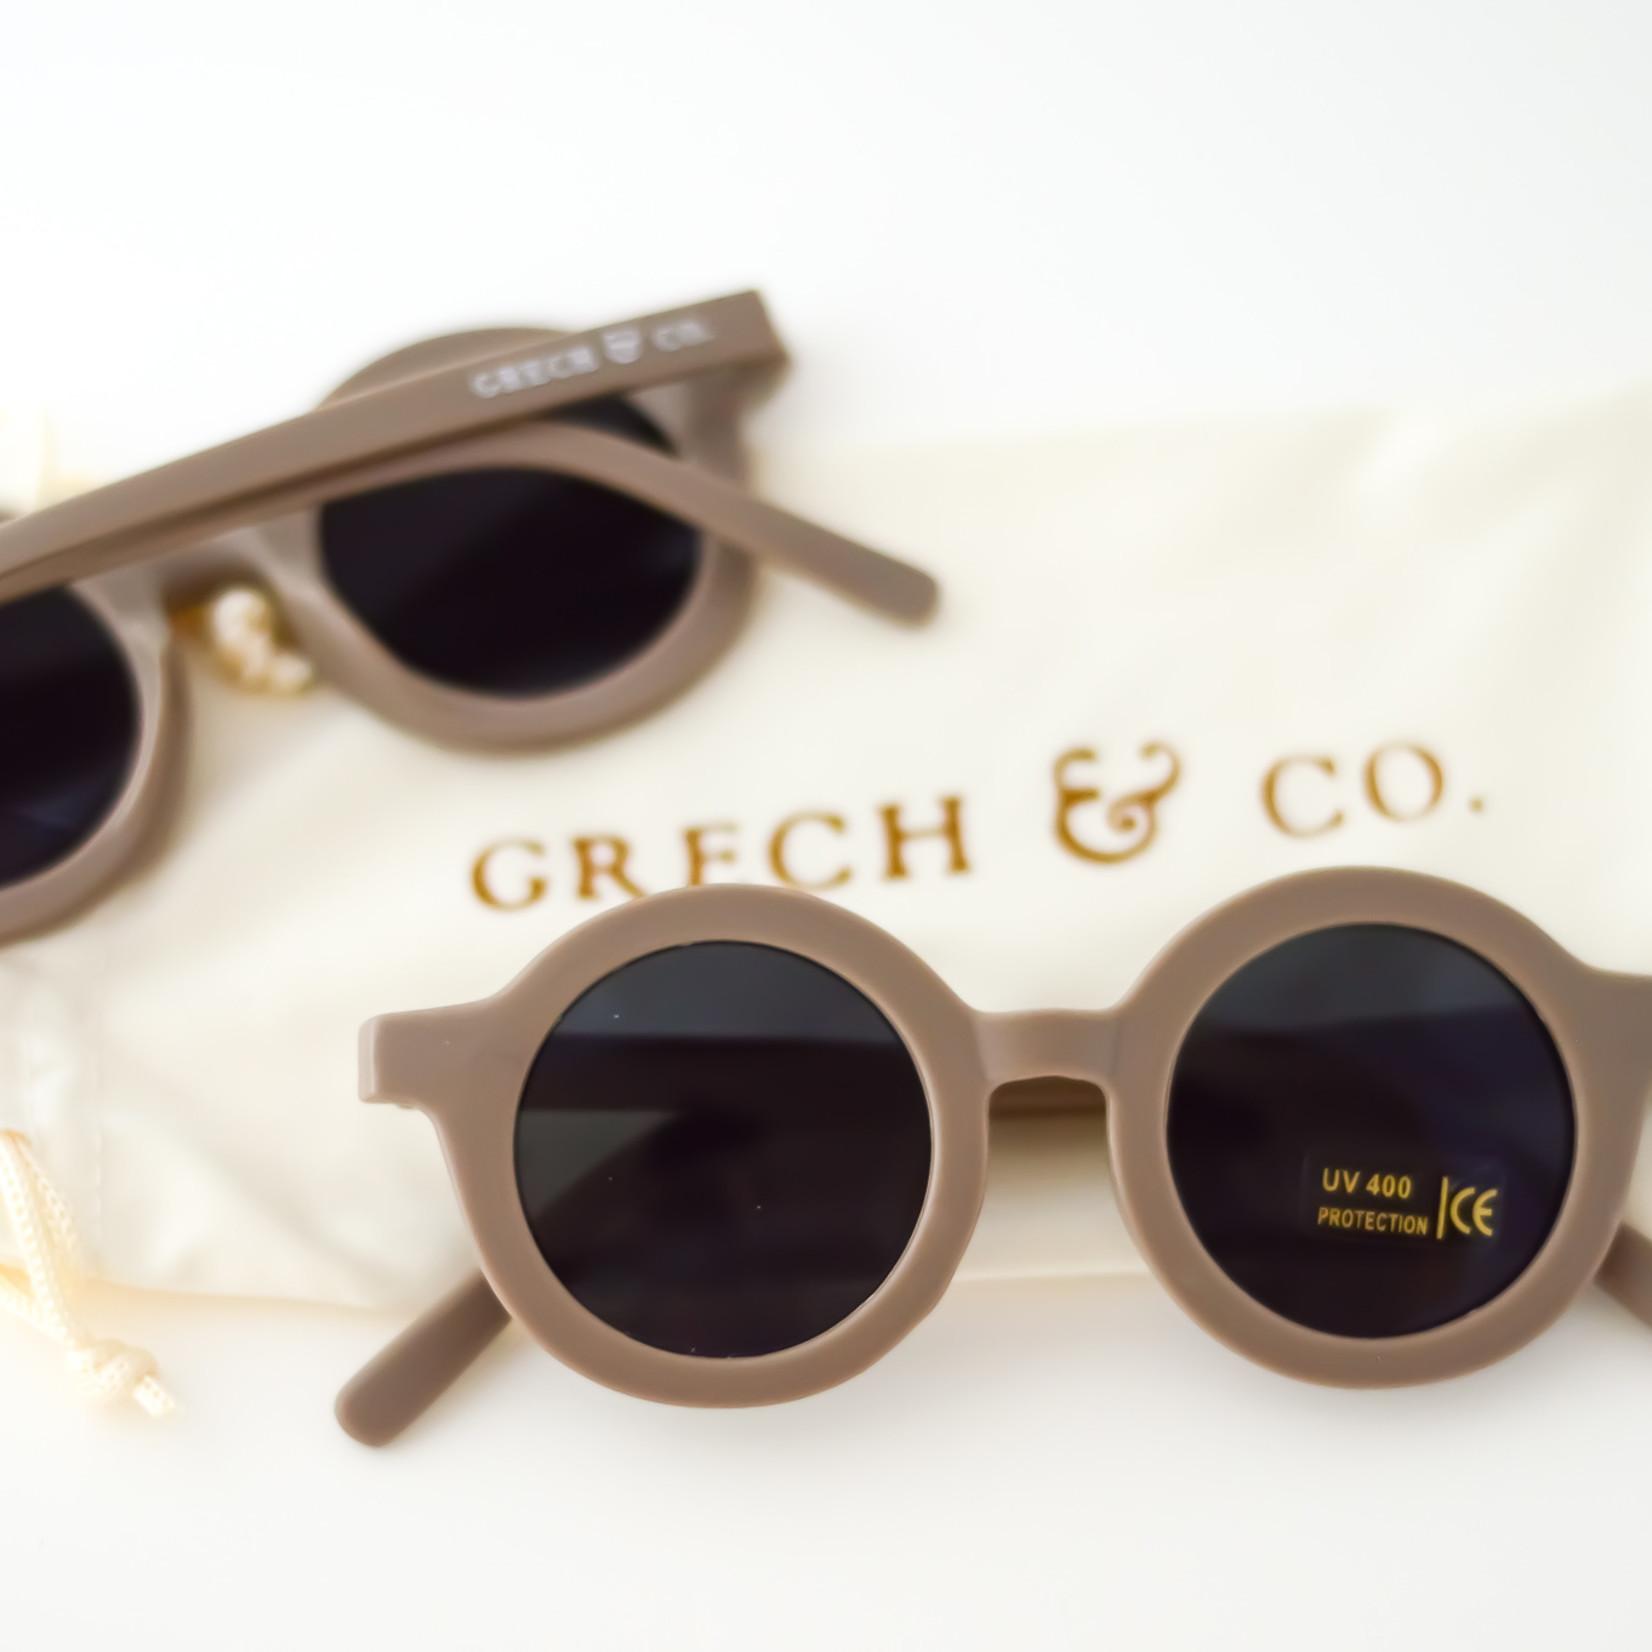 Grech & Co Grech & Co | Zonnebril - Stone